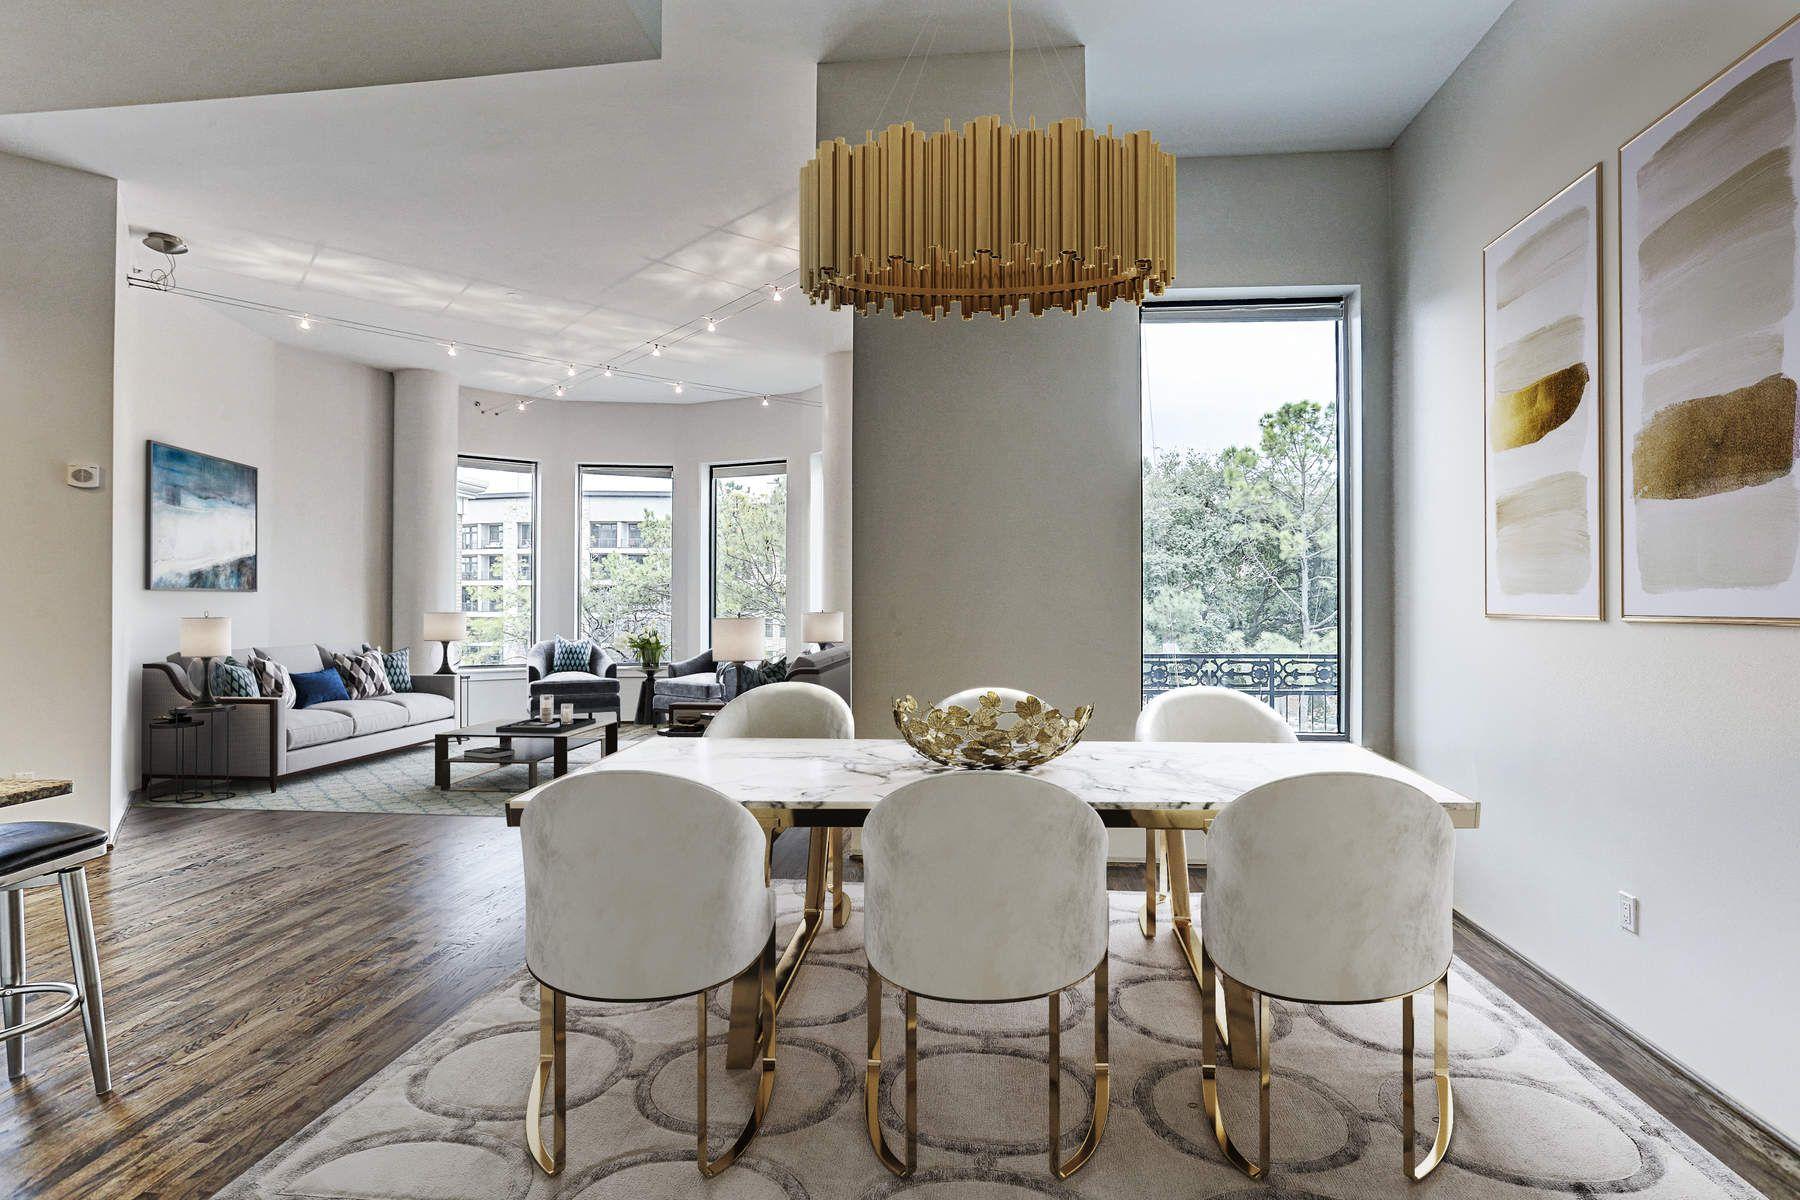 Apartment for Sale at 5005 Hidalgo Street 5005 Hidalgo Street Unit 303 Houston, Texas 77056 United States